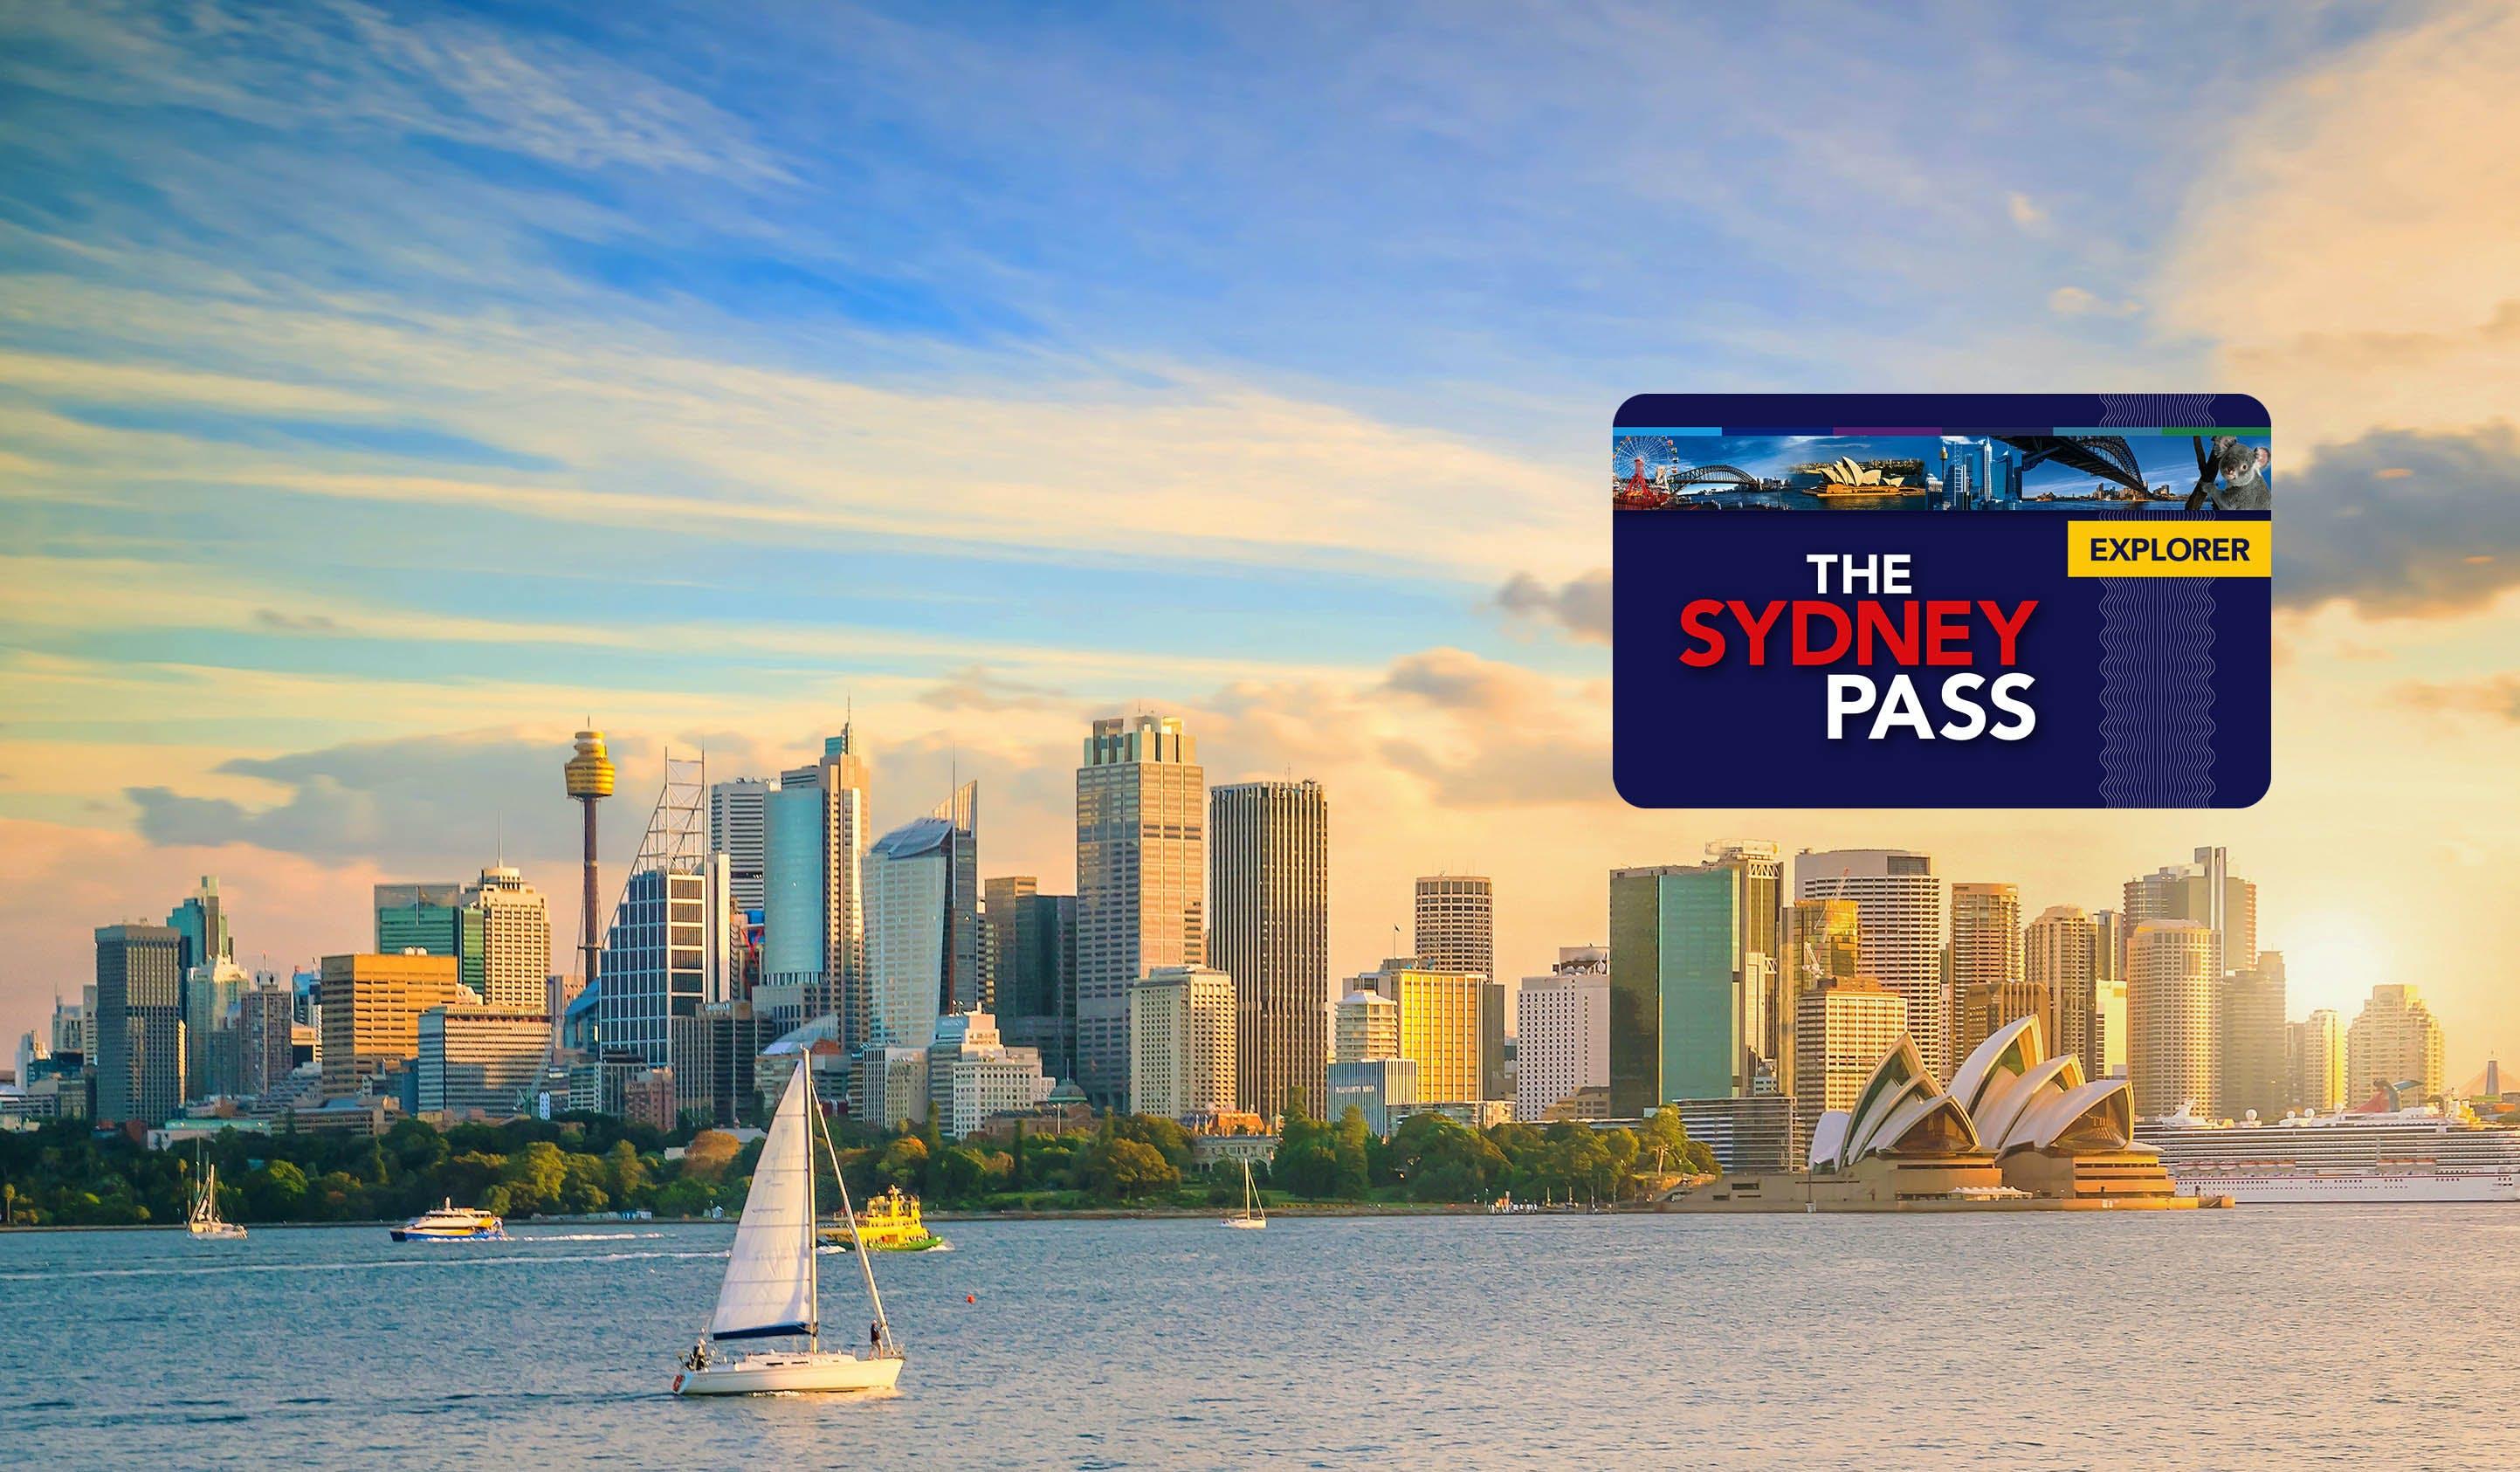 Sydney Explorer Pass